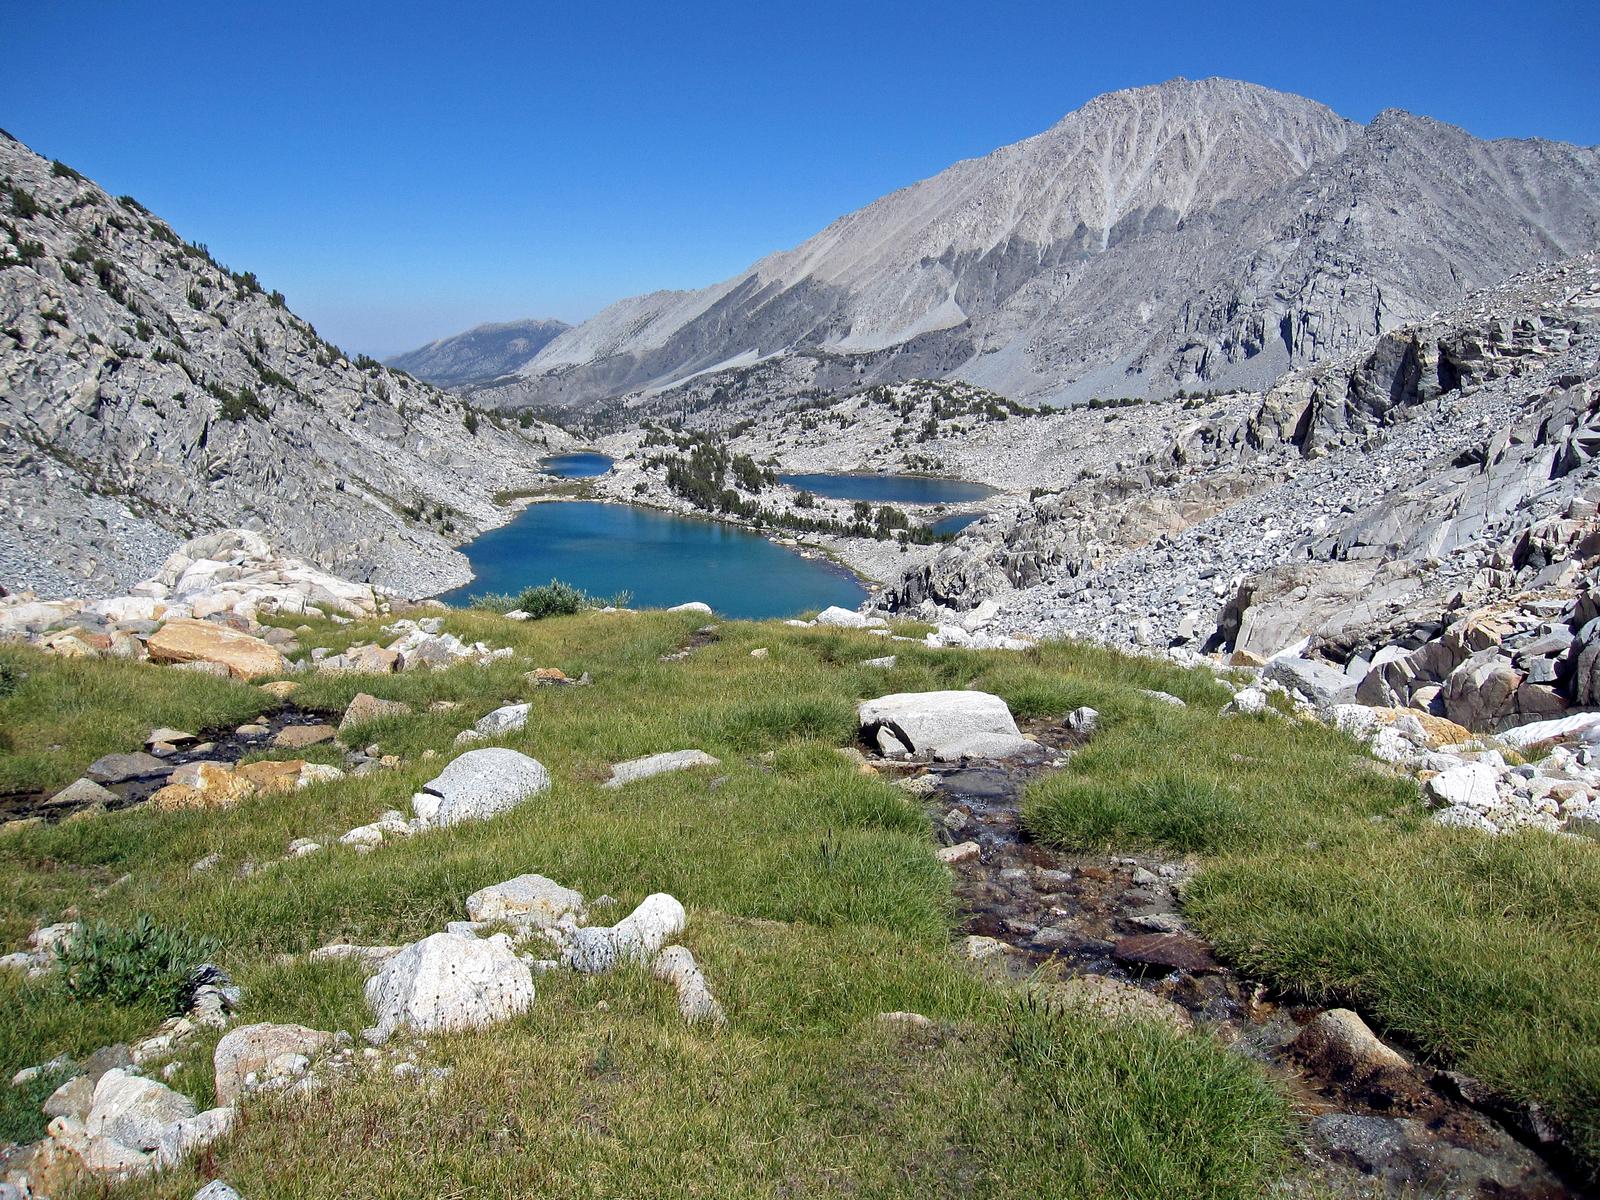 Little Lakes Valley, John Muir Wilderness, California